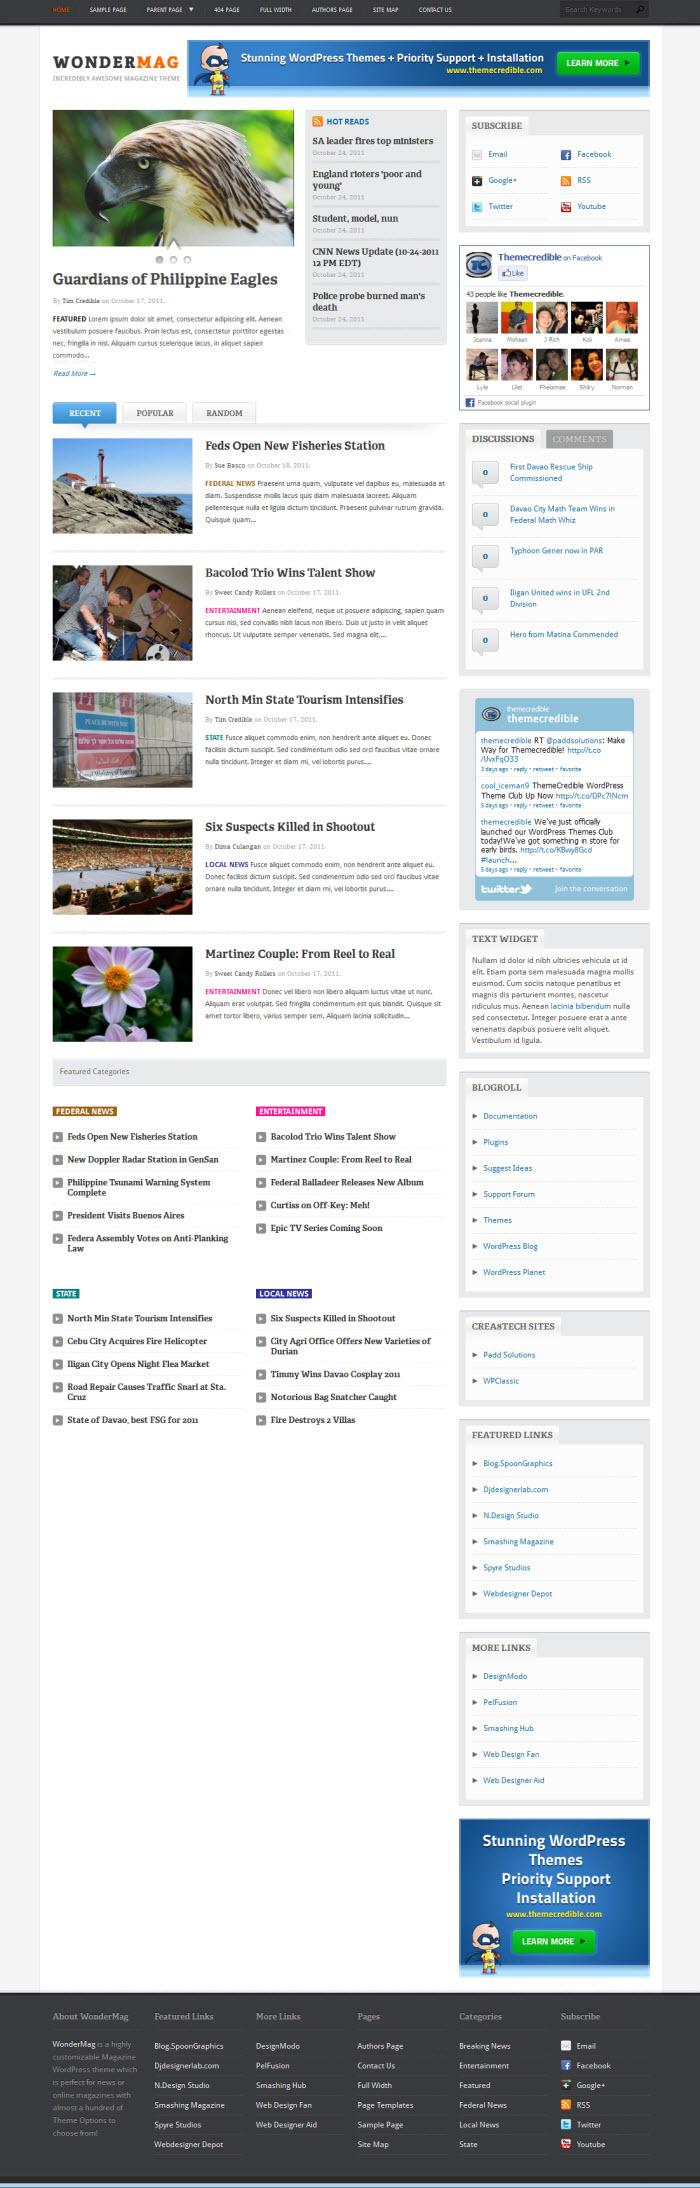 WonderMag WordPress theme from Themecredible